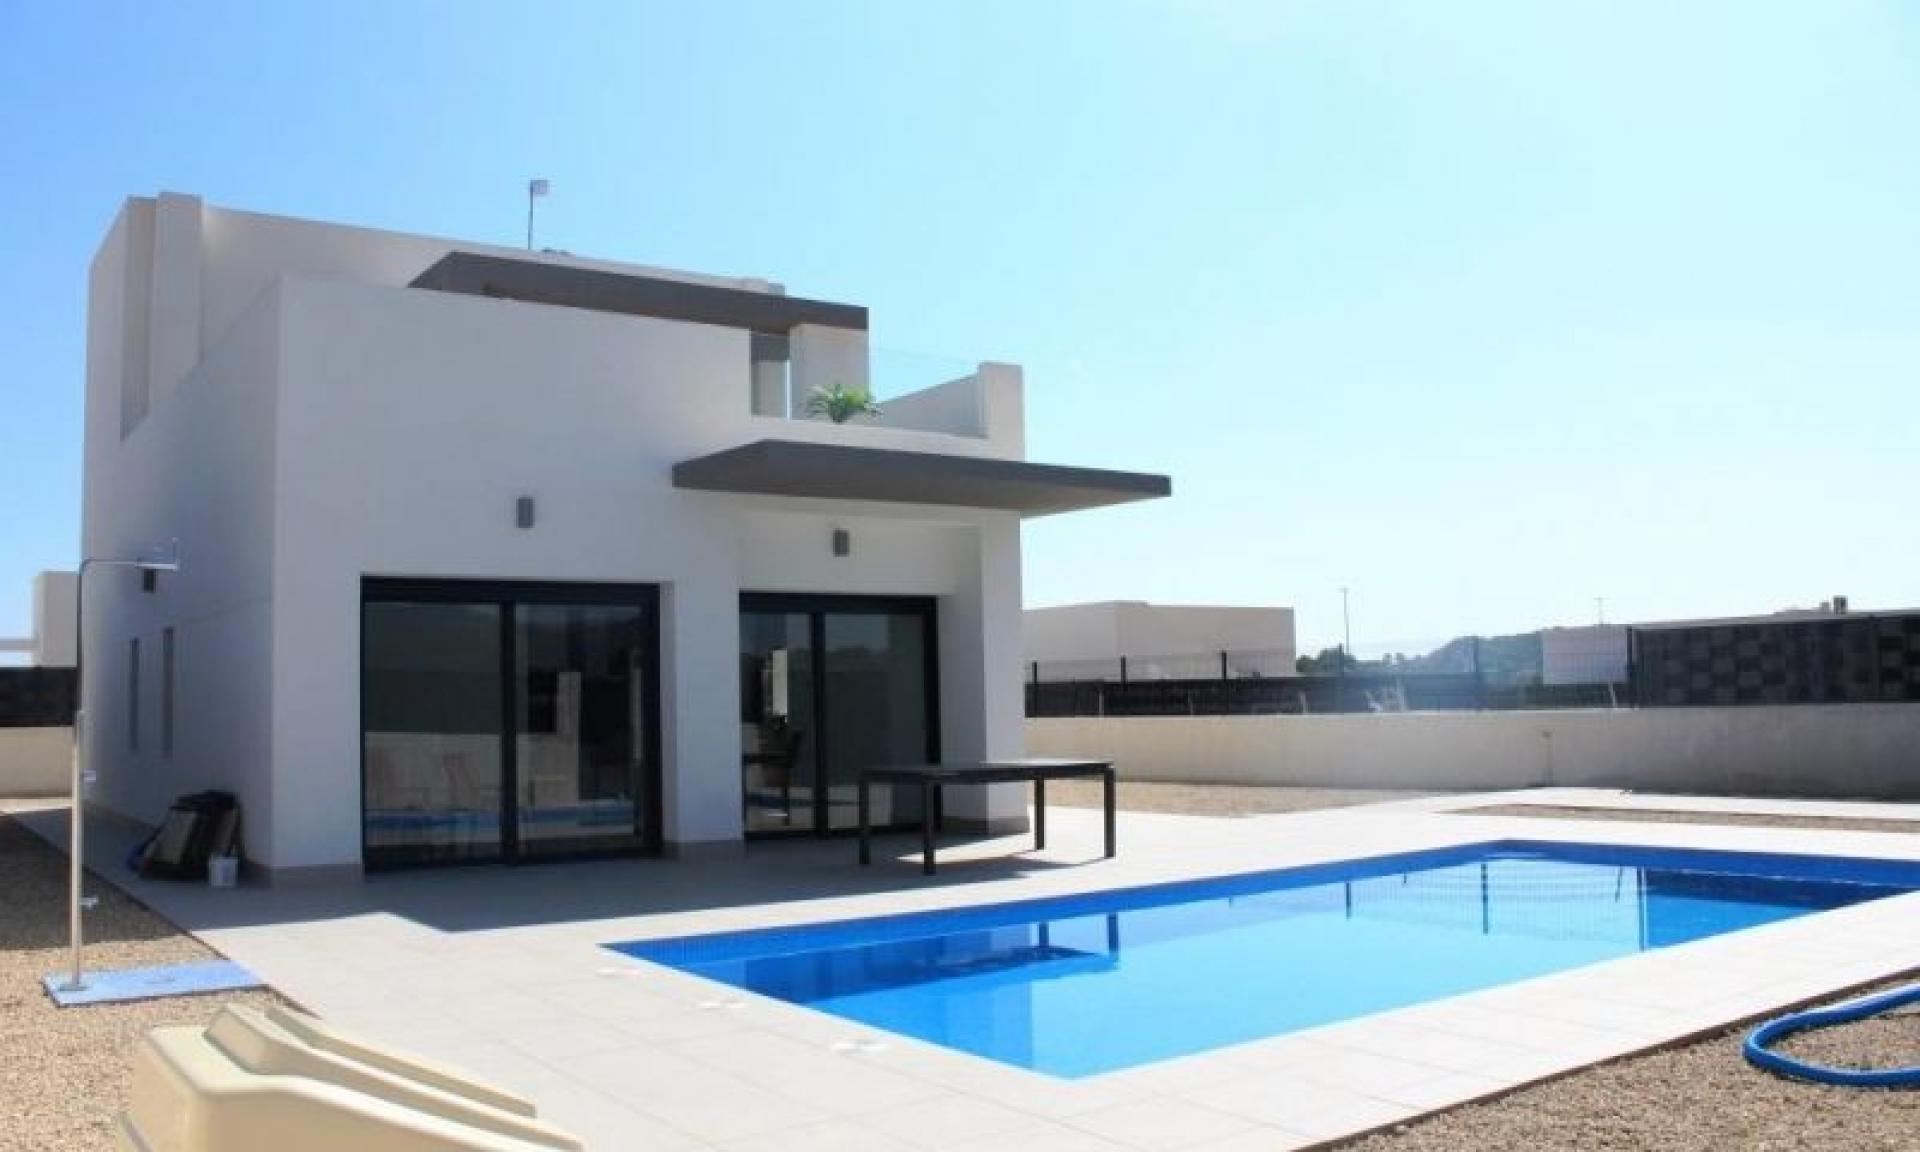 Zelf bouwen in Spanje (Alicante)